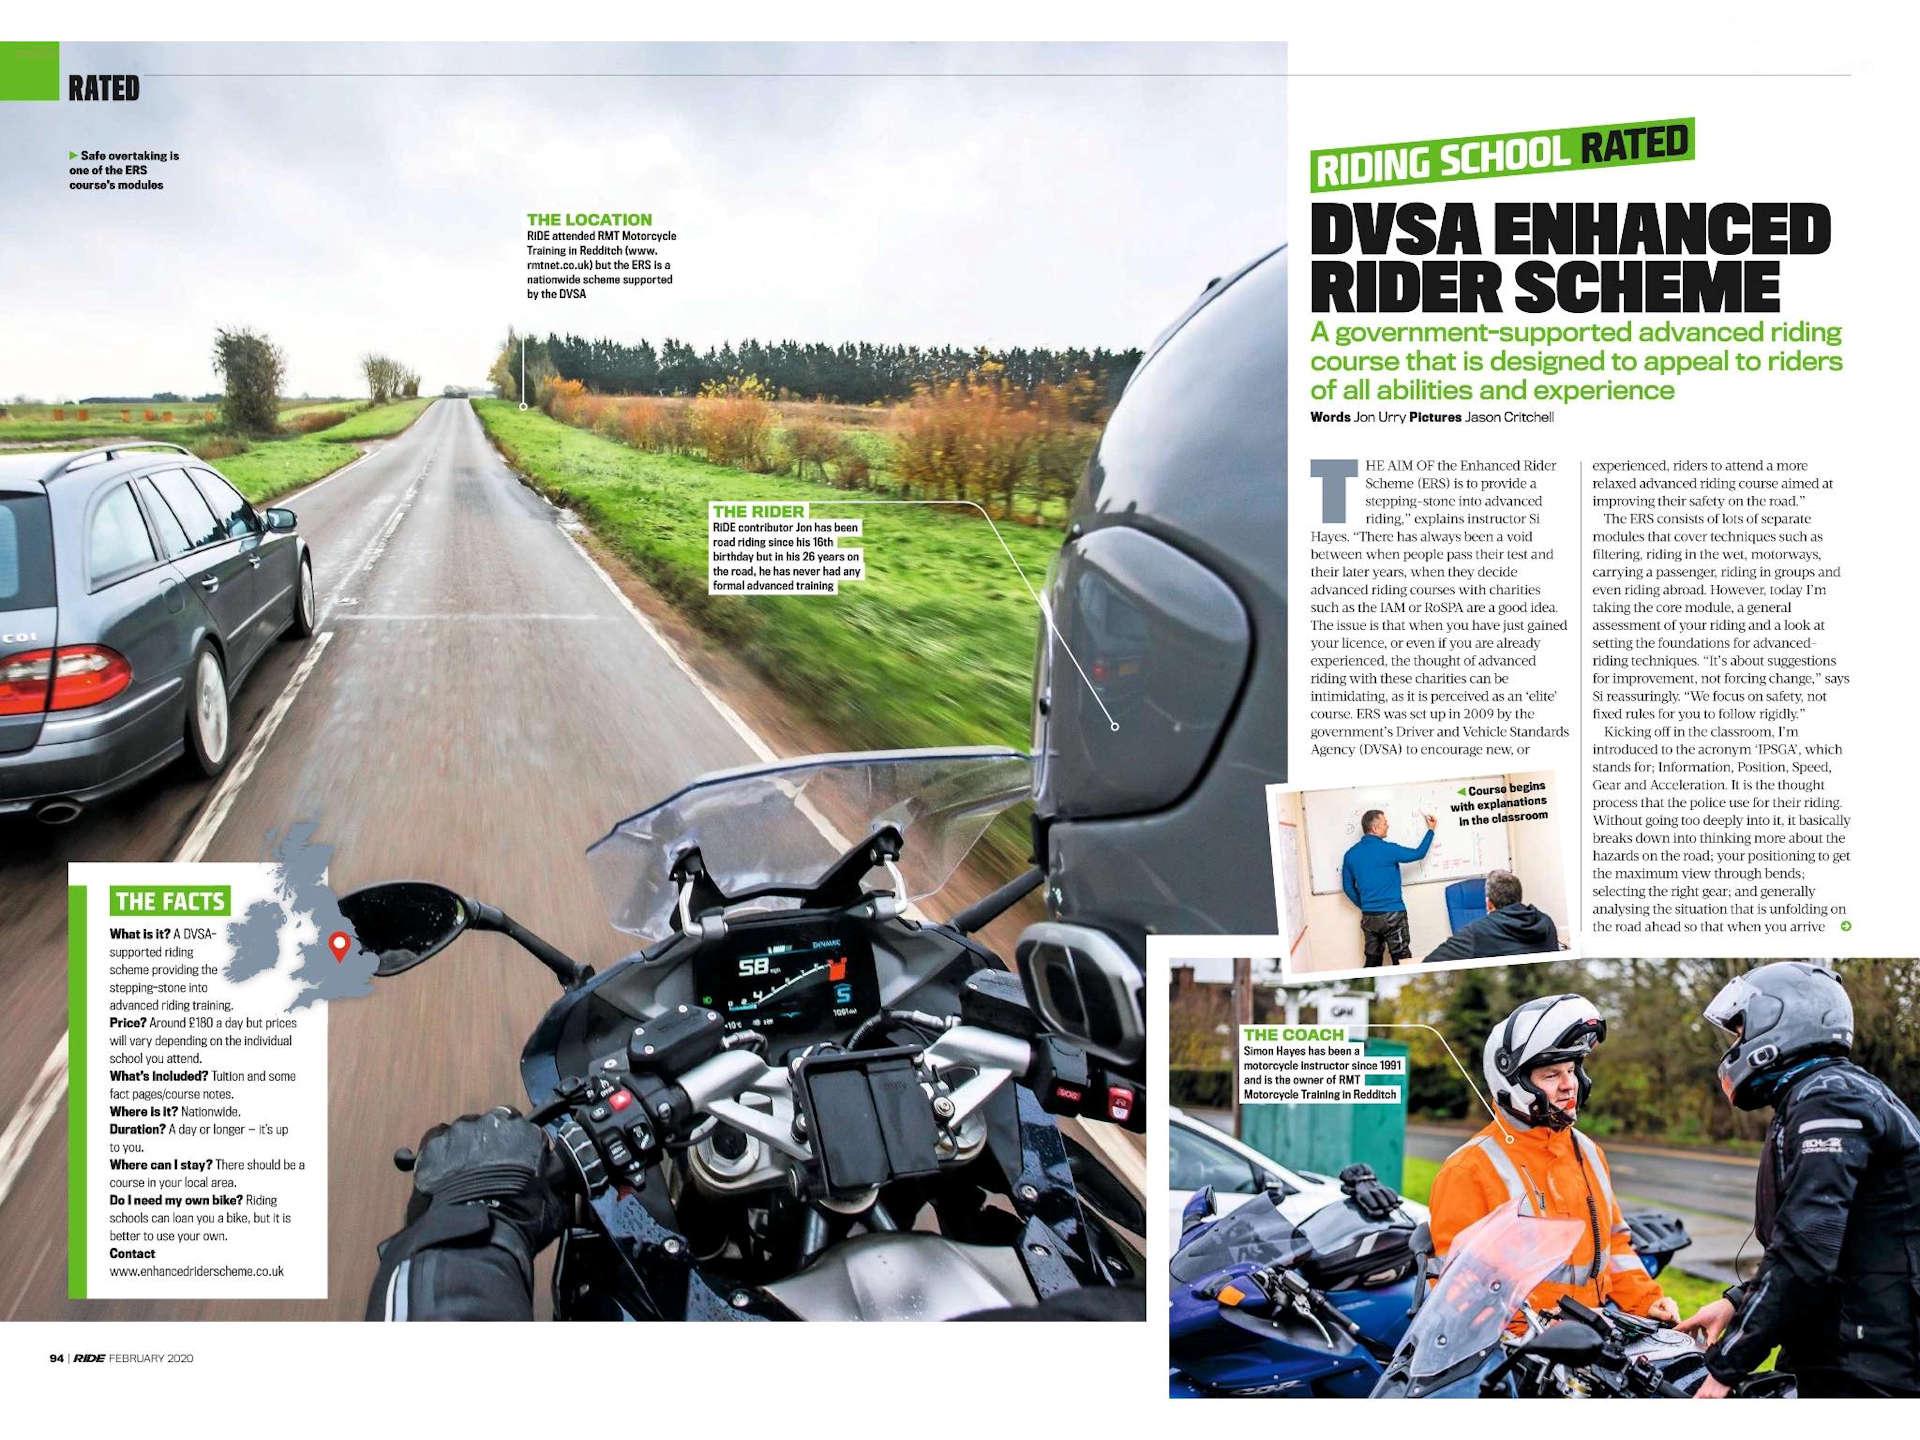 DVSA Enhanced Rider Scheme (1) Ride Magazine February 2020